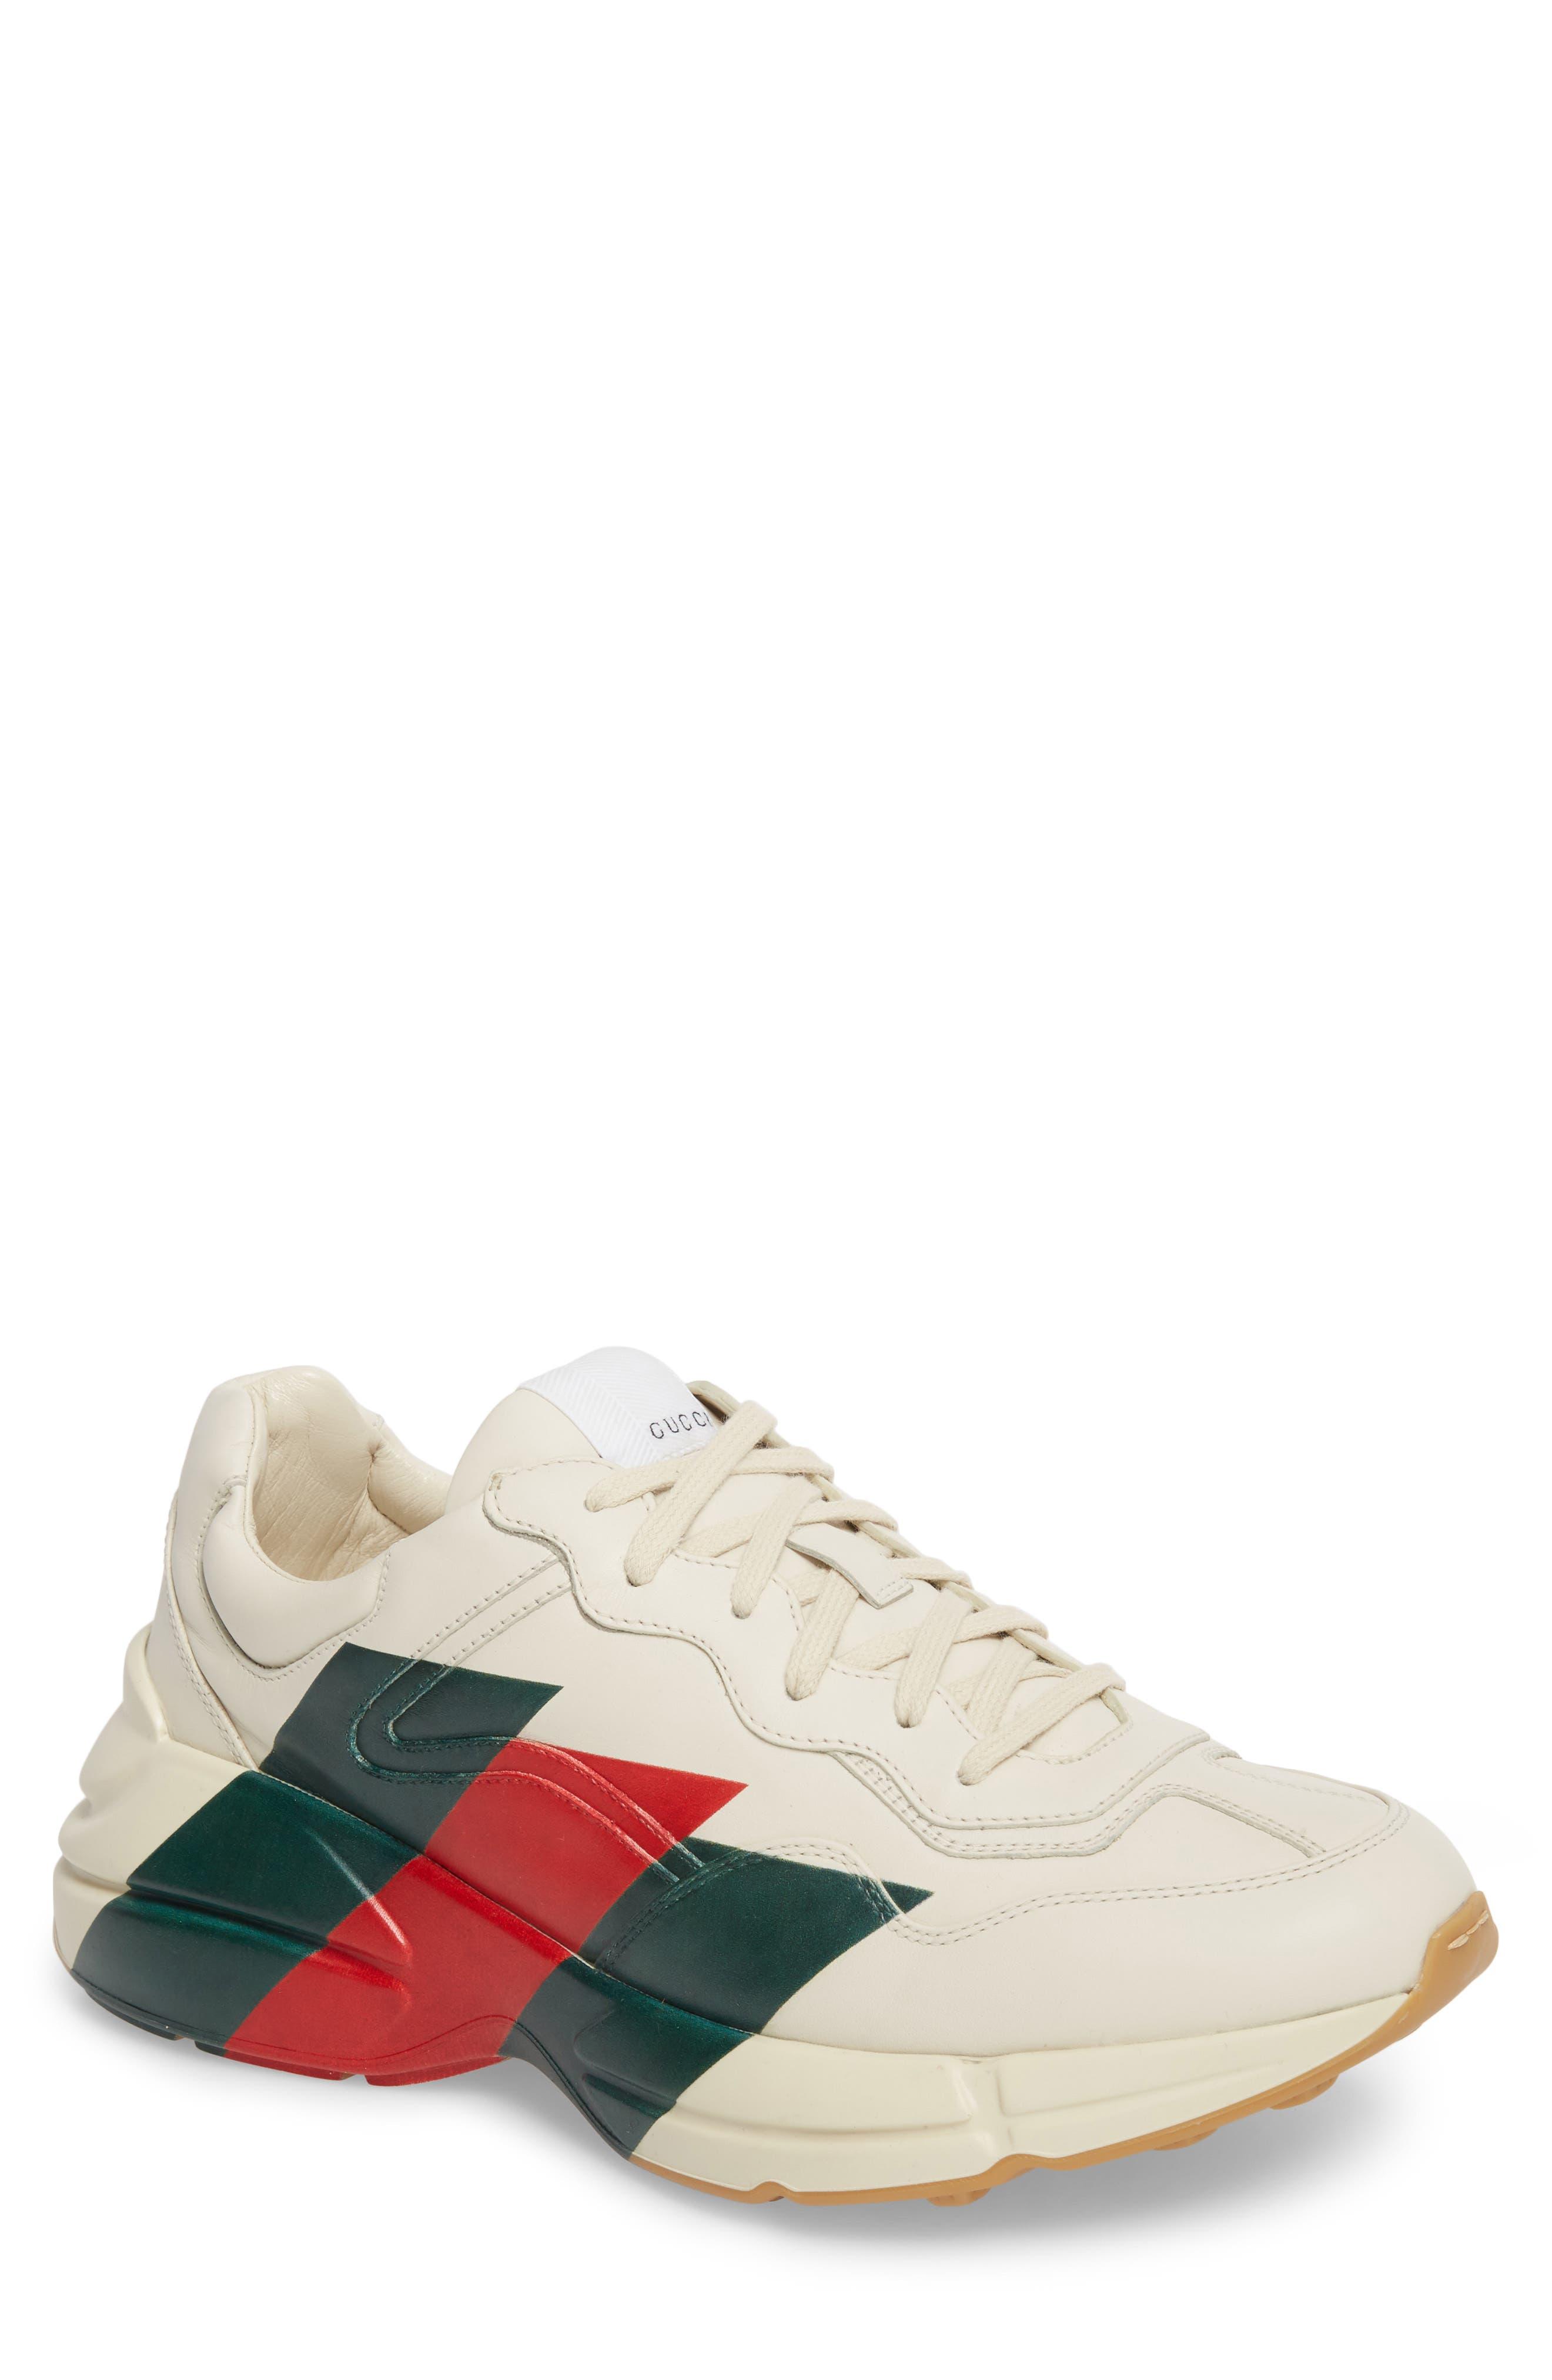 Rhyton Sneaker,                             Main thumbnail 1, color,                             MYSTIC WHITE